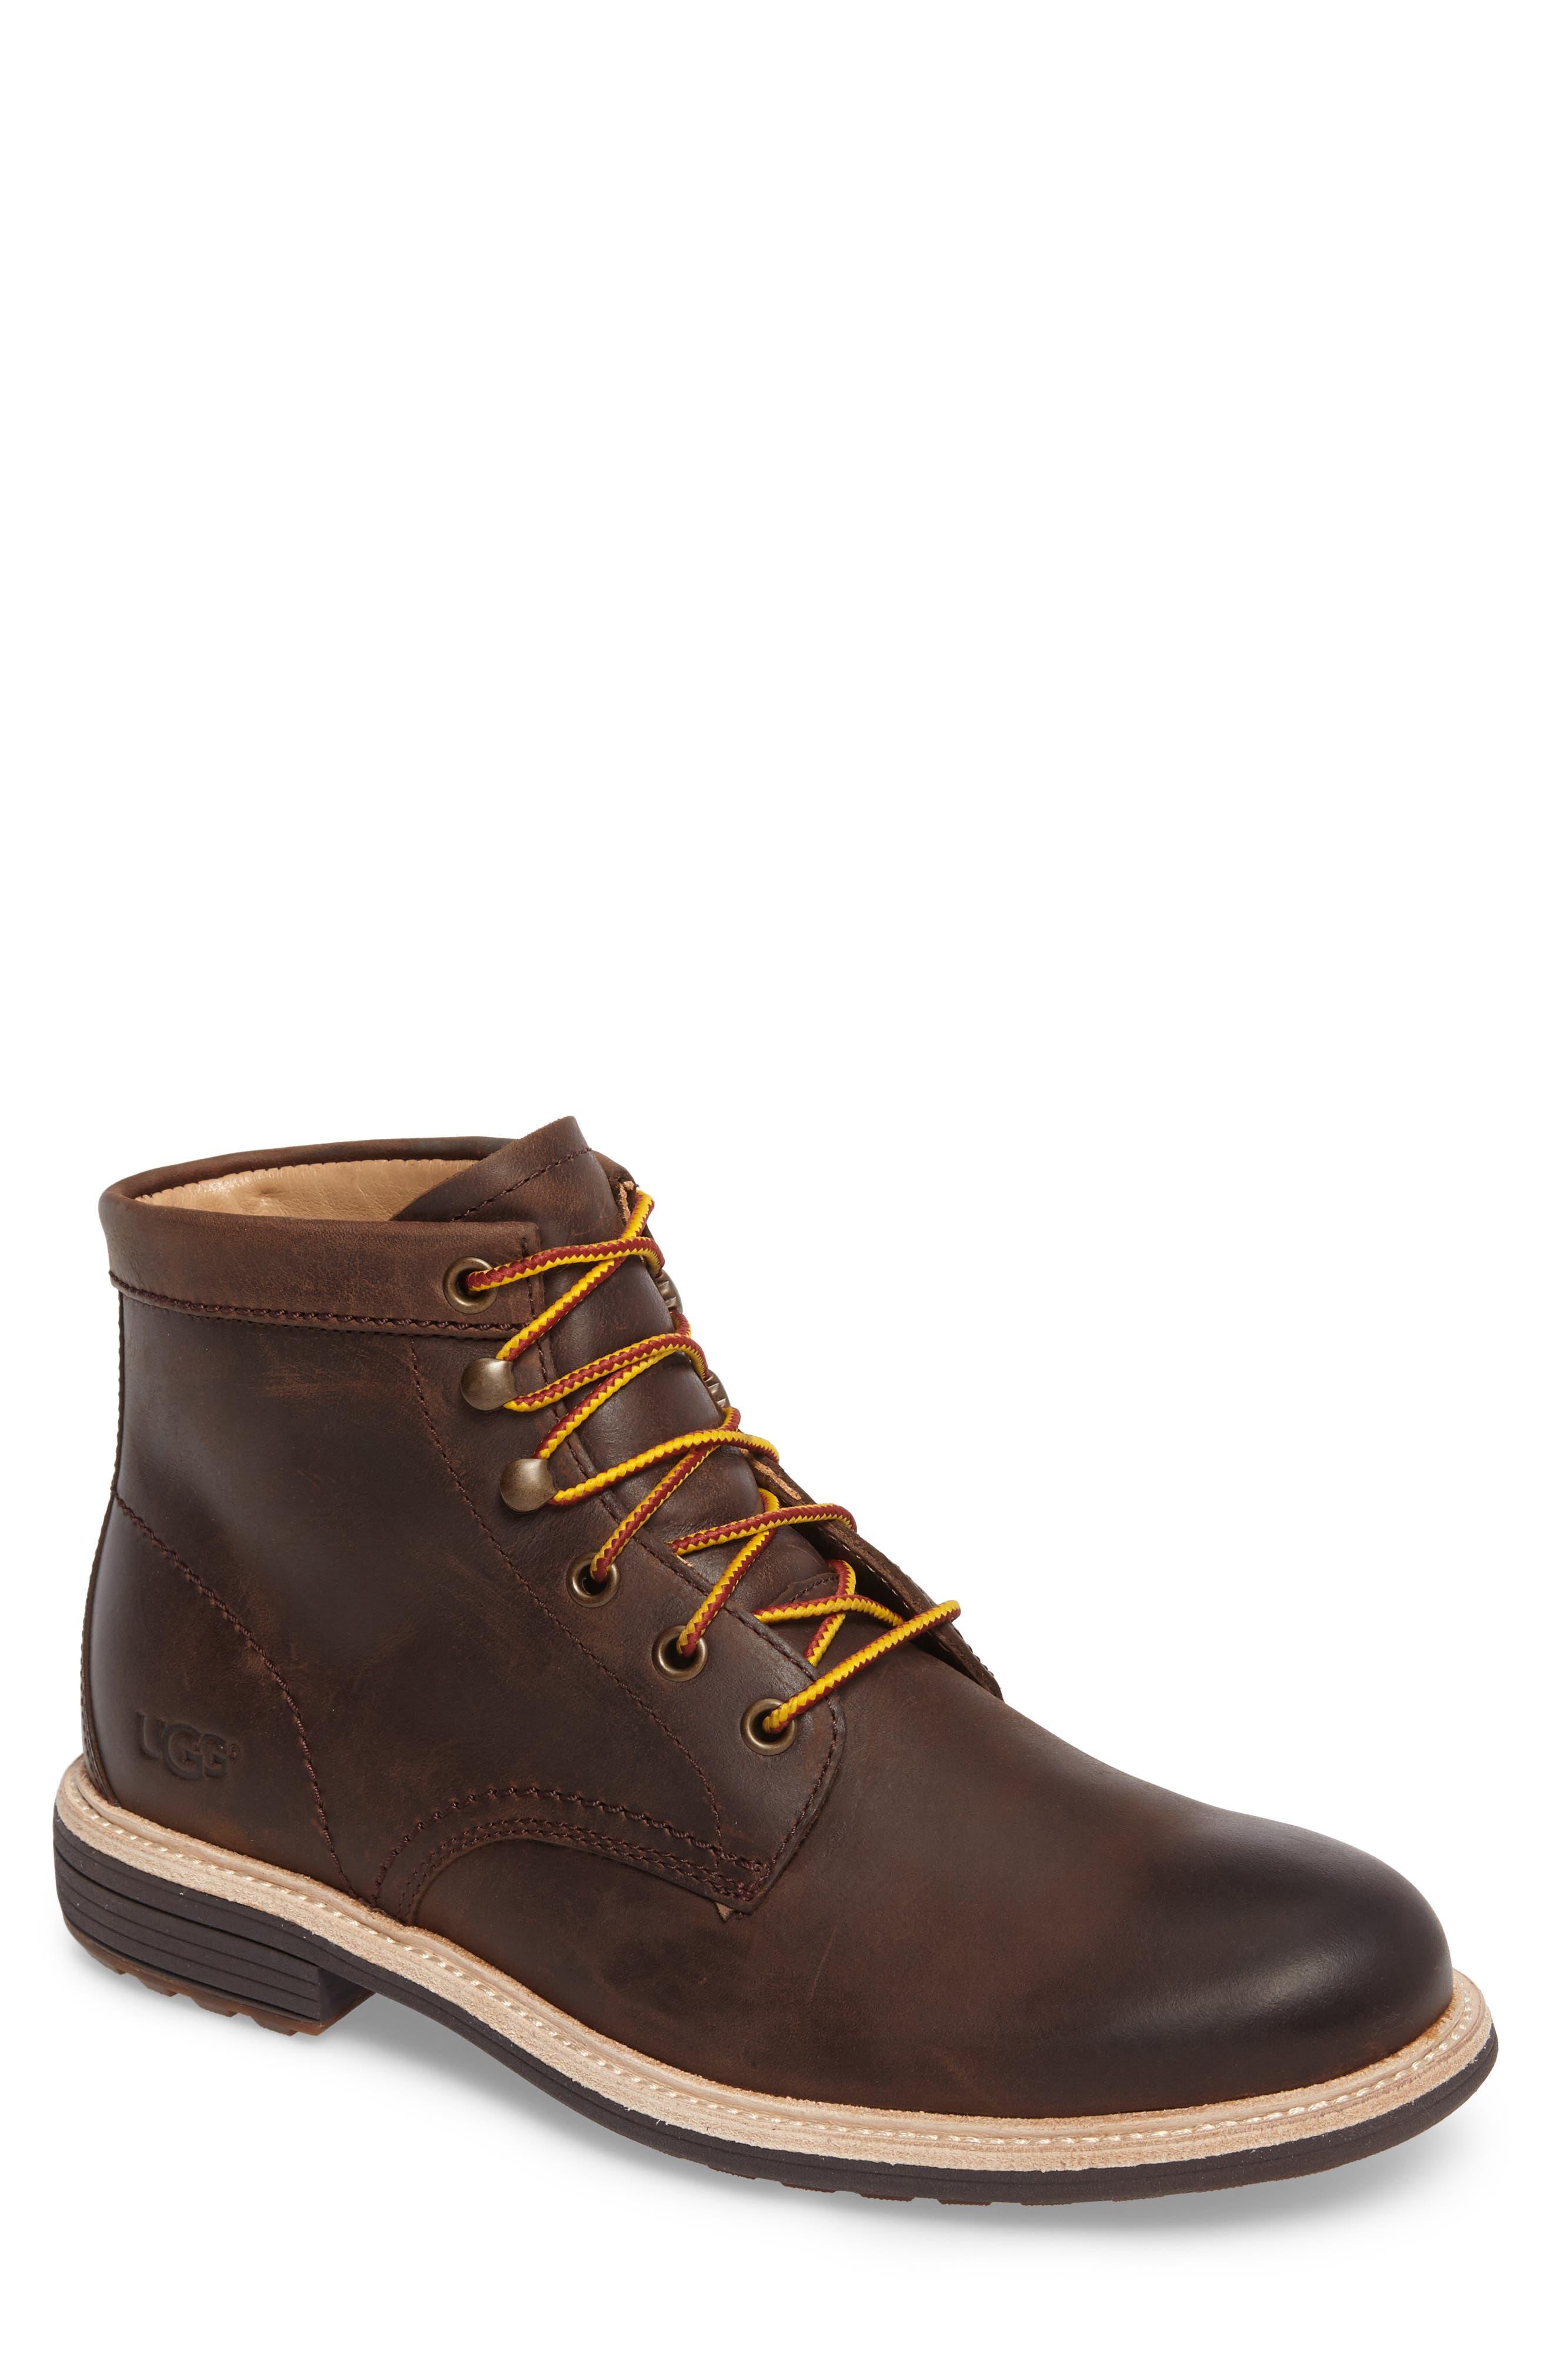 Vestmar Plain Toe Boot,                         Main,                         color, GRIZZLY